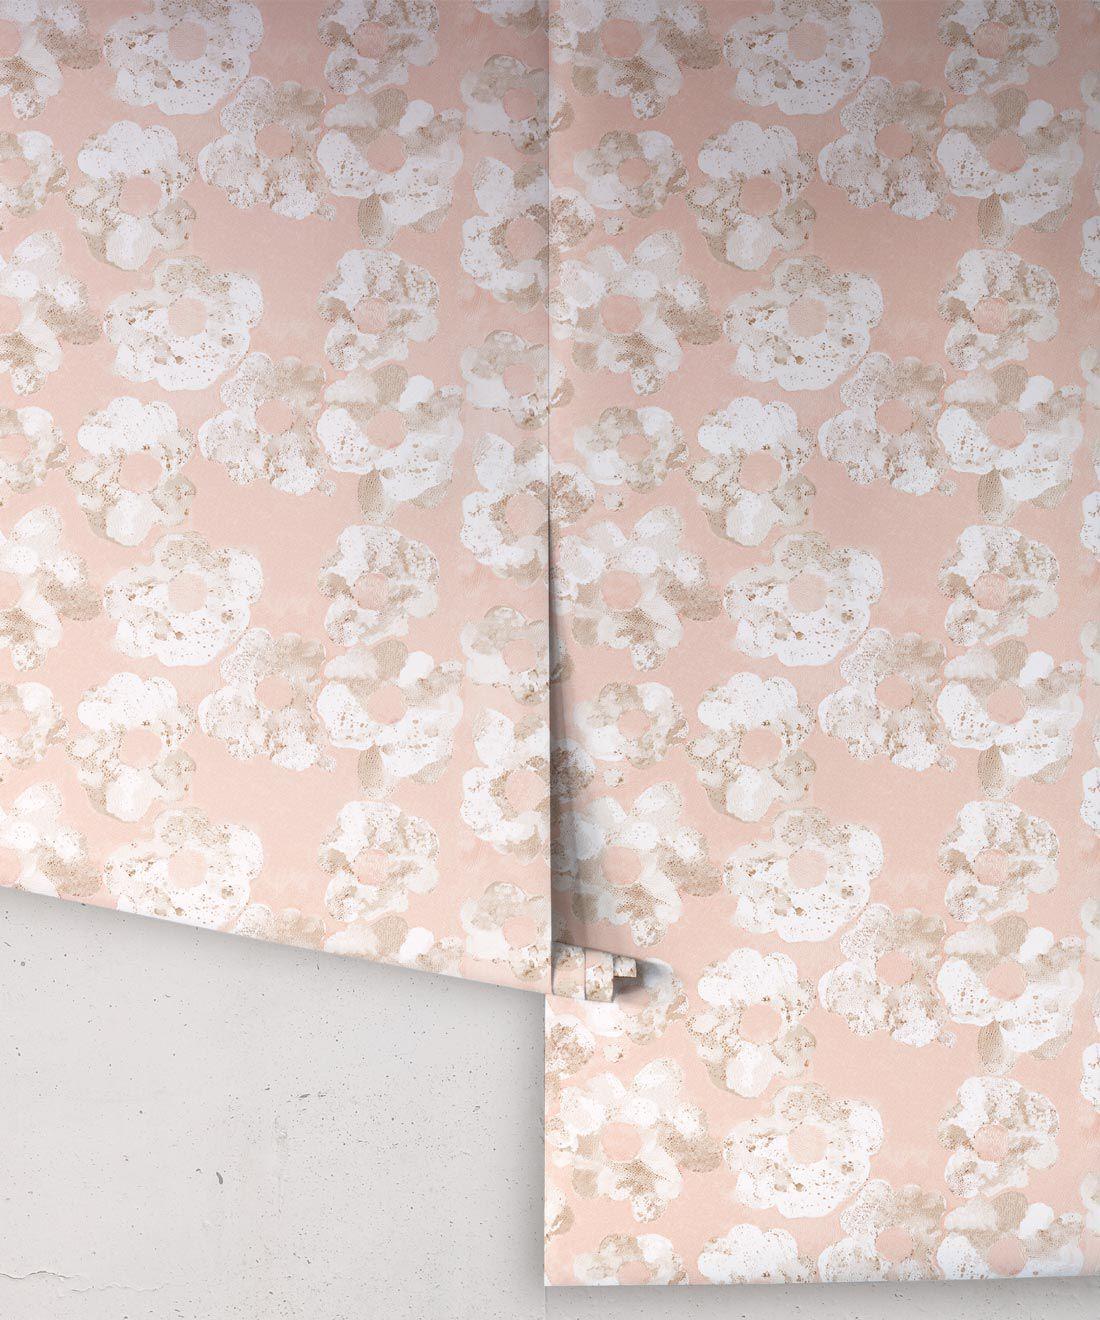 Cherry Blossom Wallpaper Blush • Shibori Floral • Rolls